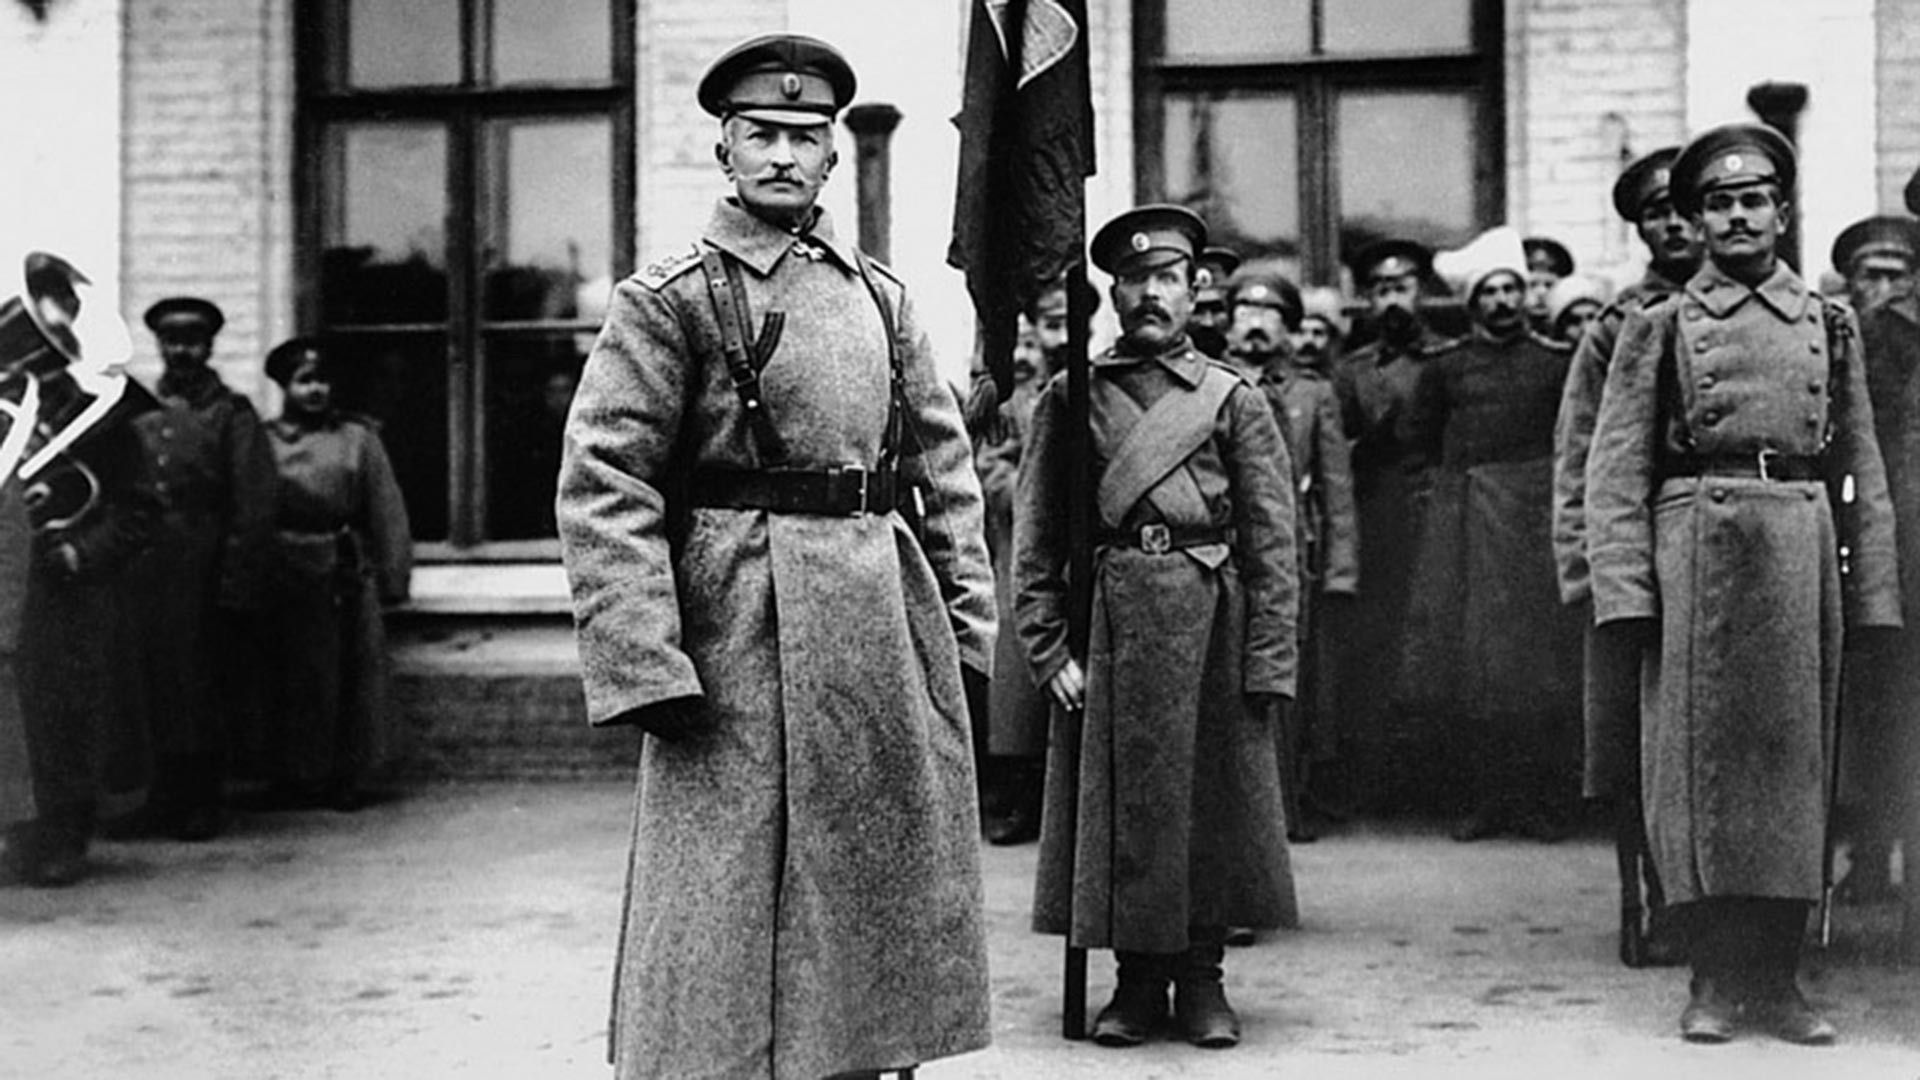 Prvi svjetski rat. General A. A. Brusilov.